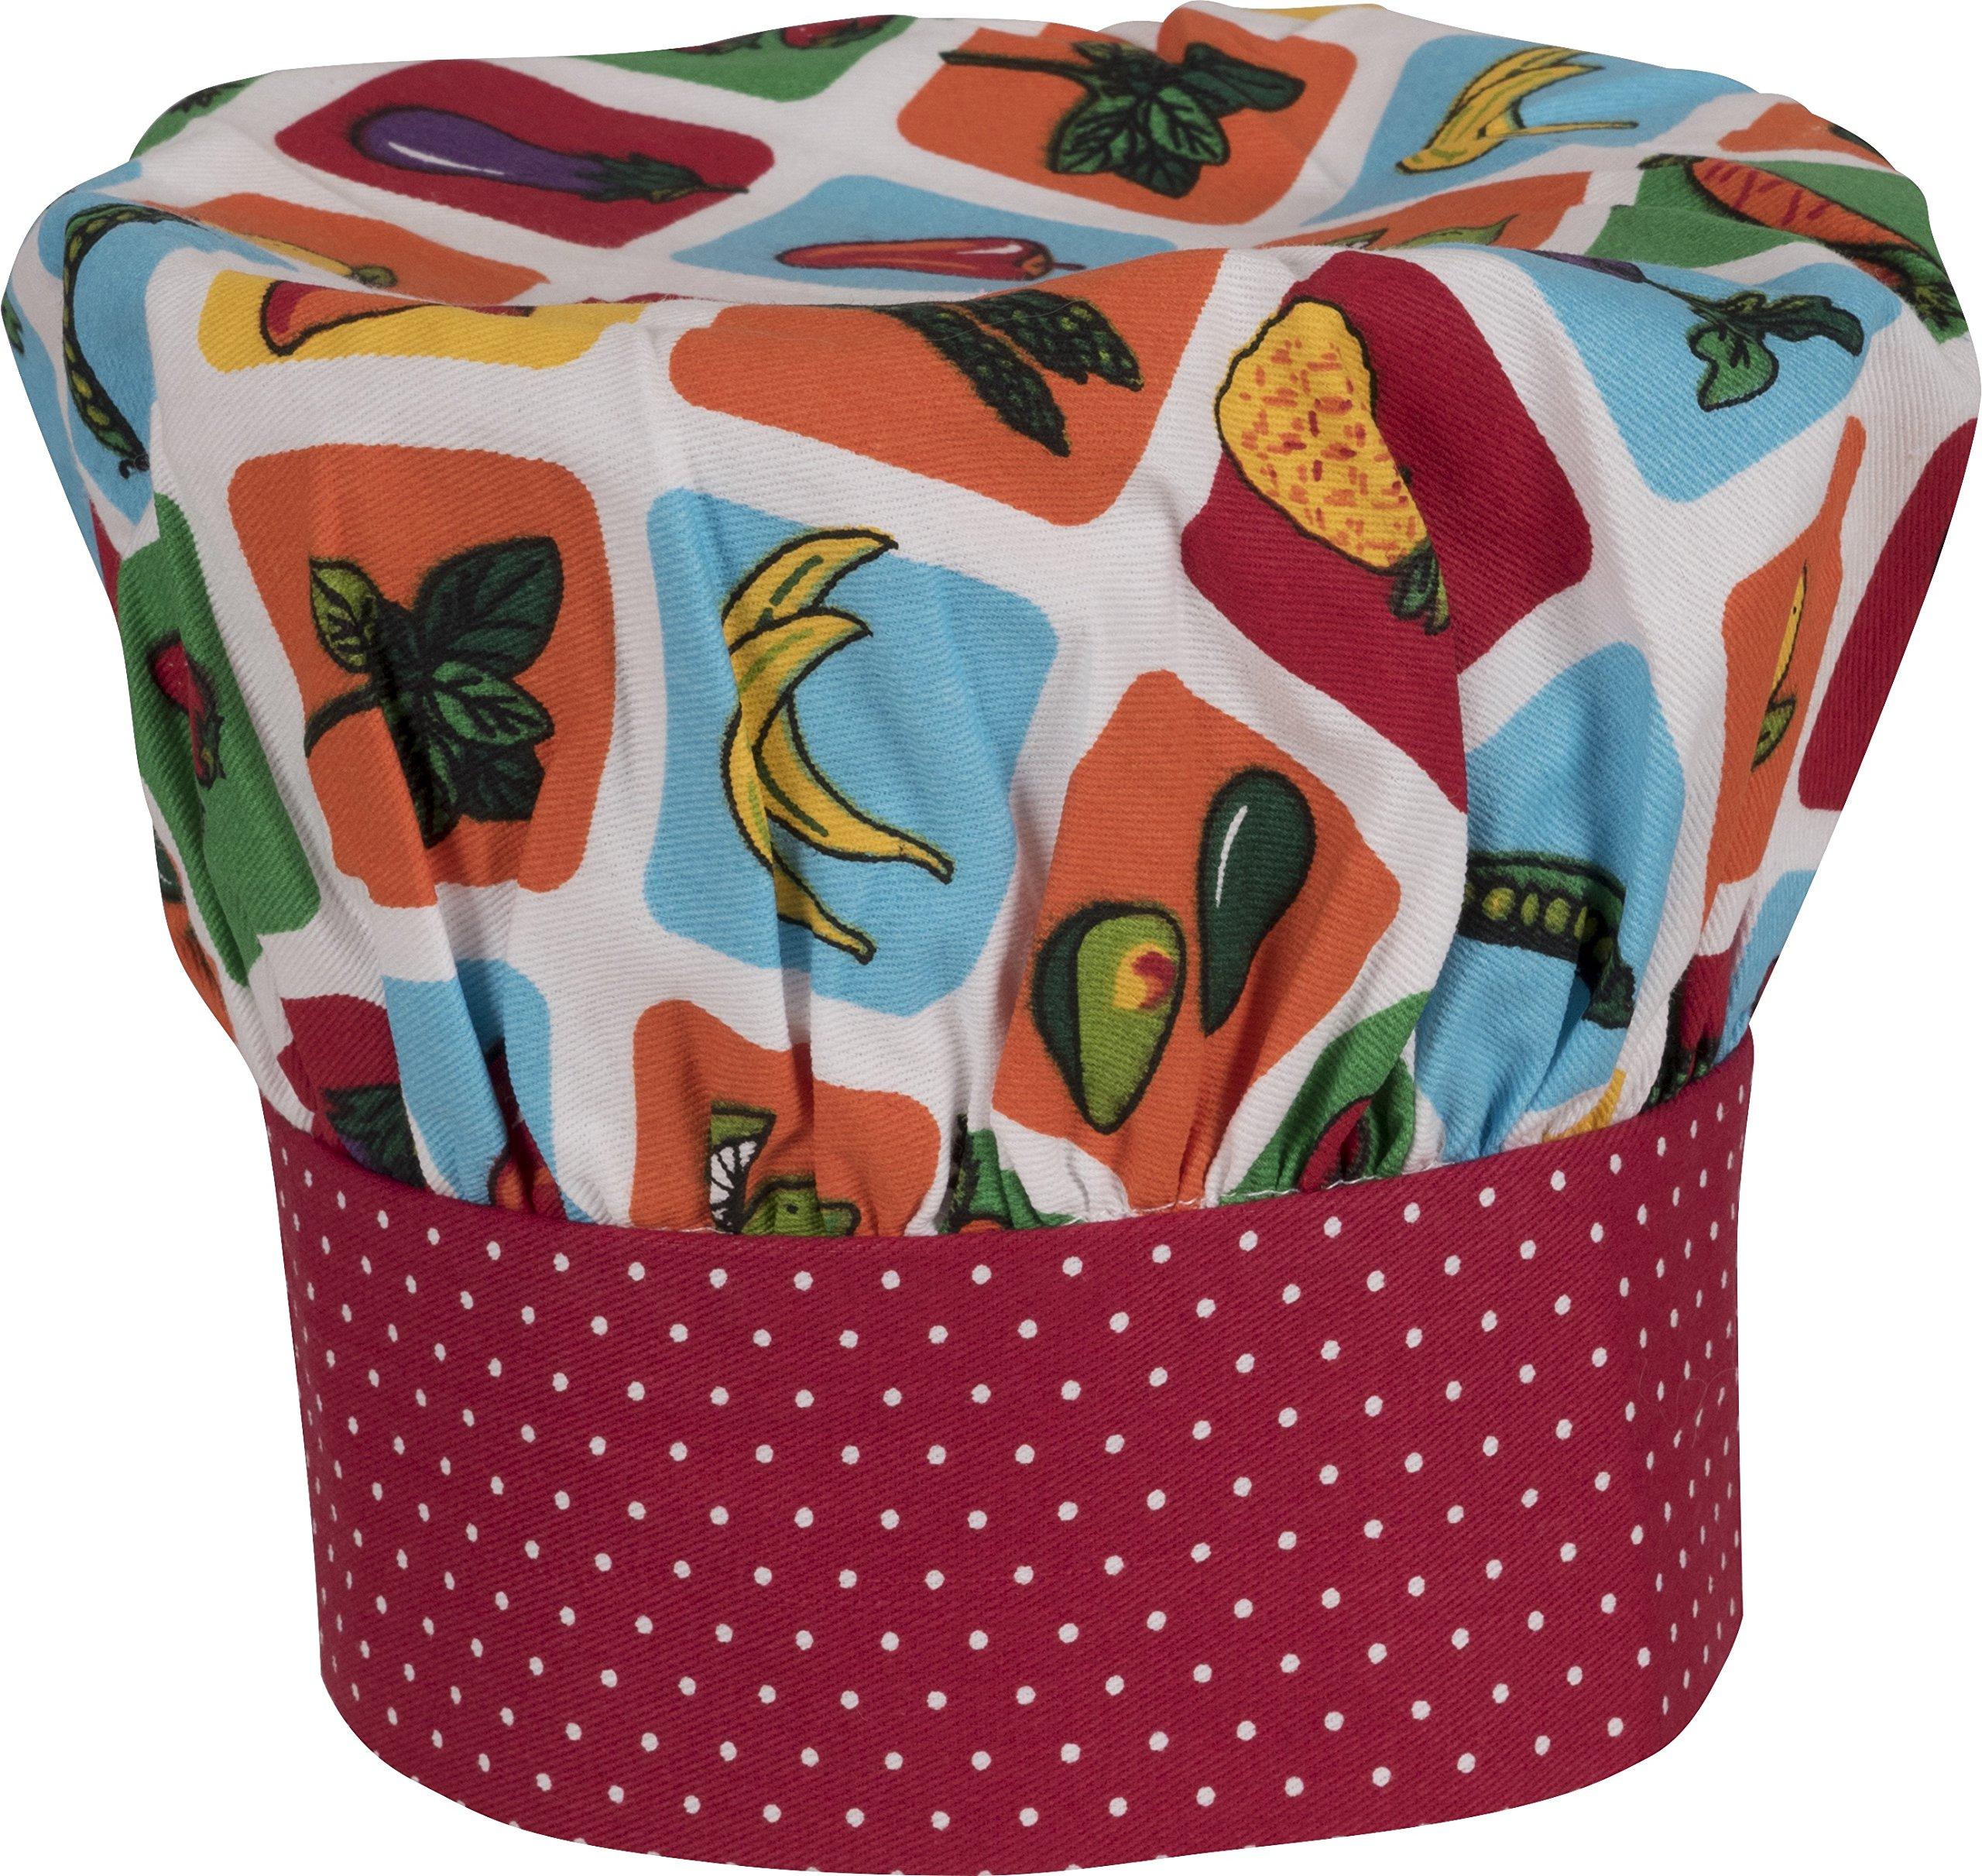 Handstand Kitchen Child's 100% Cotton 'Farmers Market' Adjustable Band Chef's Hat